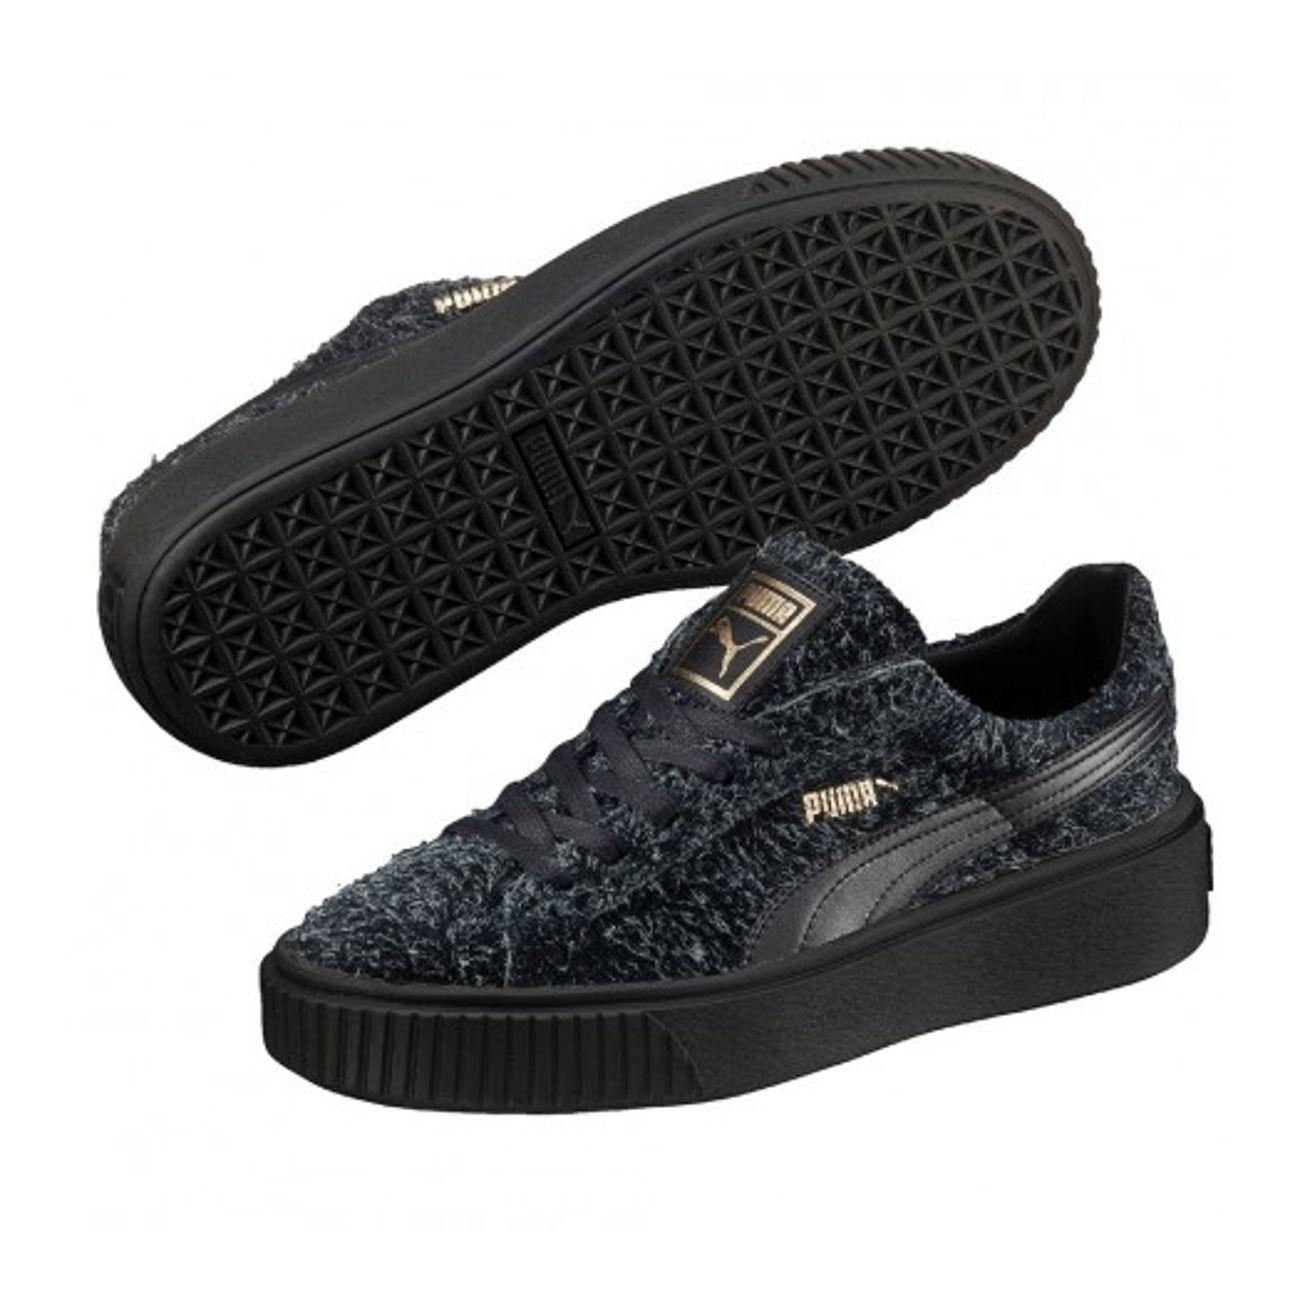 bac516775b39c4 ... Mode- Lifestyle femme PUMA Chaussures Puma Suede Platform Elemental  Noir ...